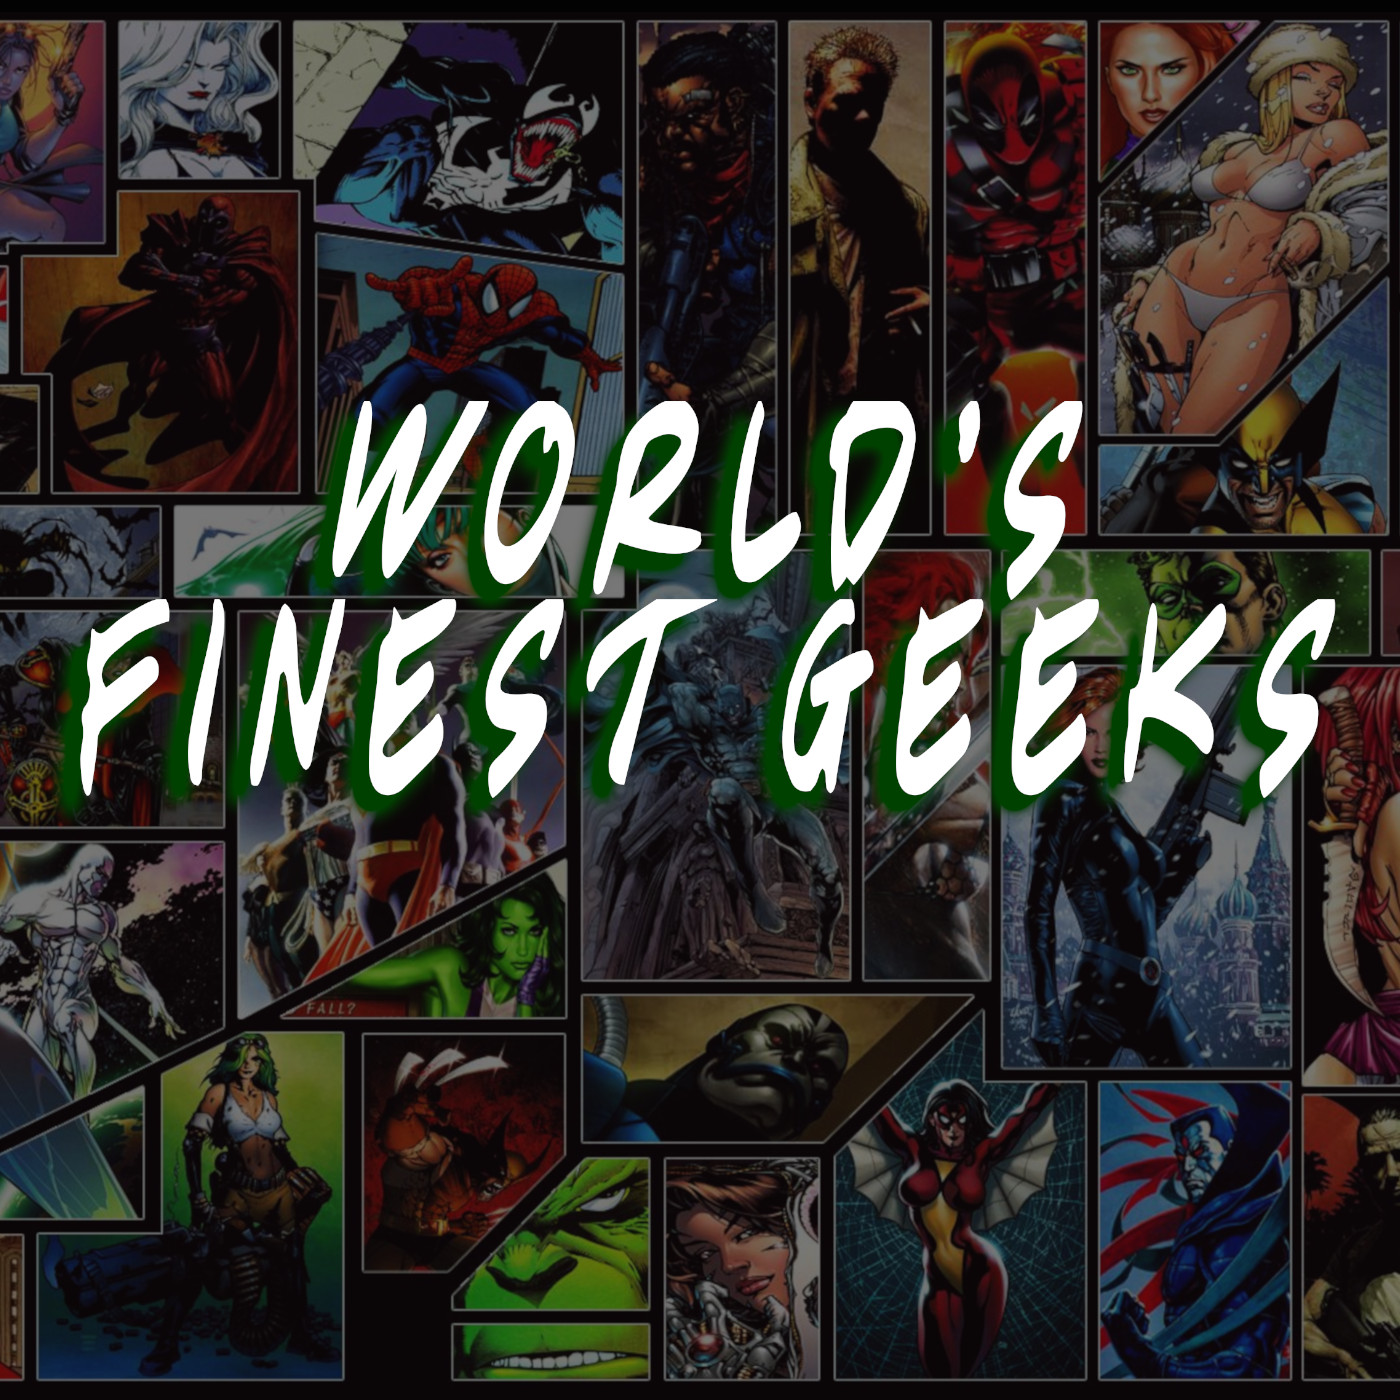 Worlds Finest Geeks Podcast 09/27/2019